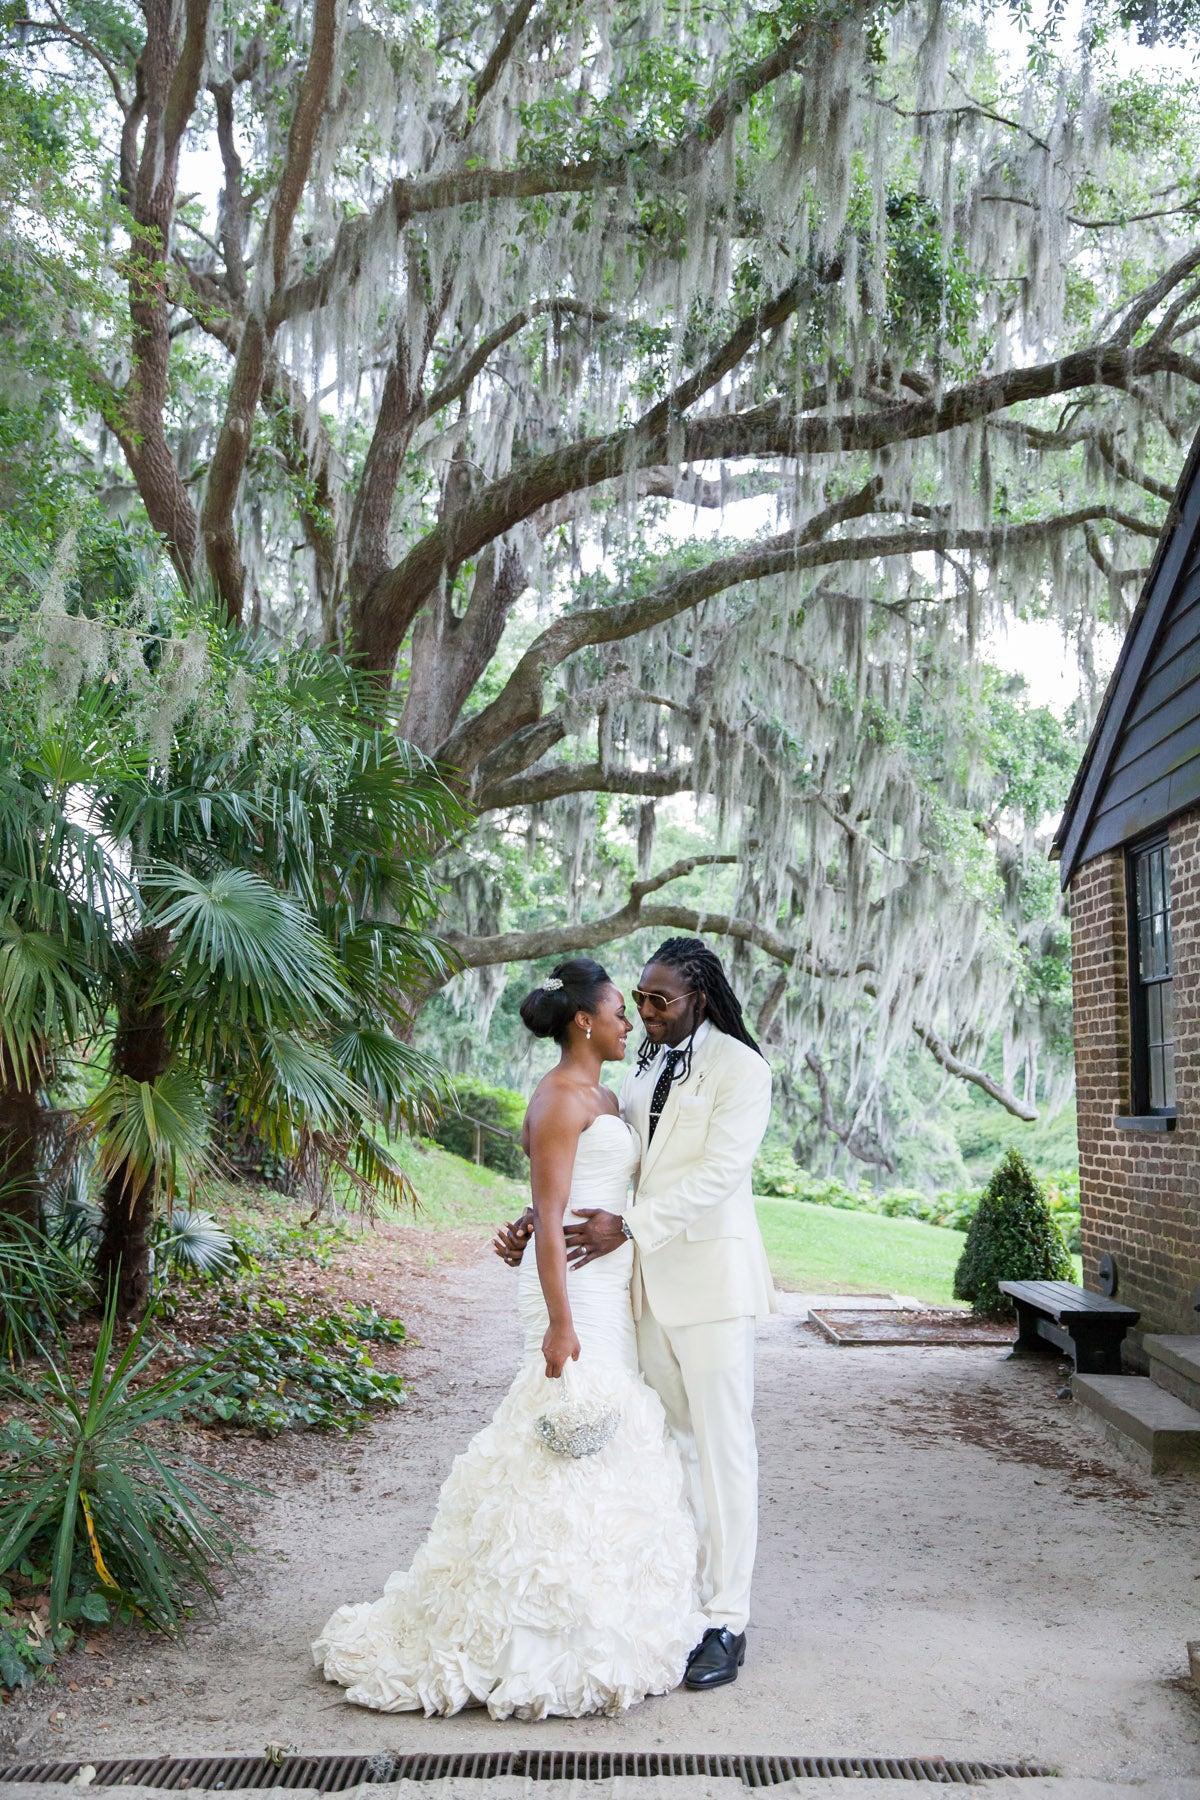 Bridal Bliss: Shuntae and Dunta's Wedding Story